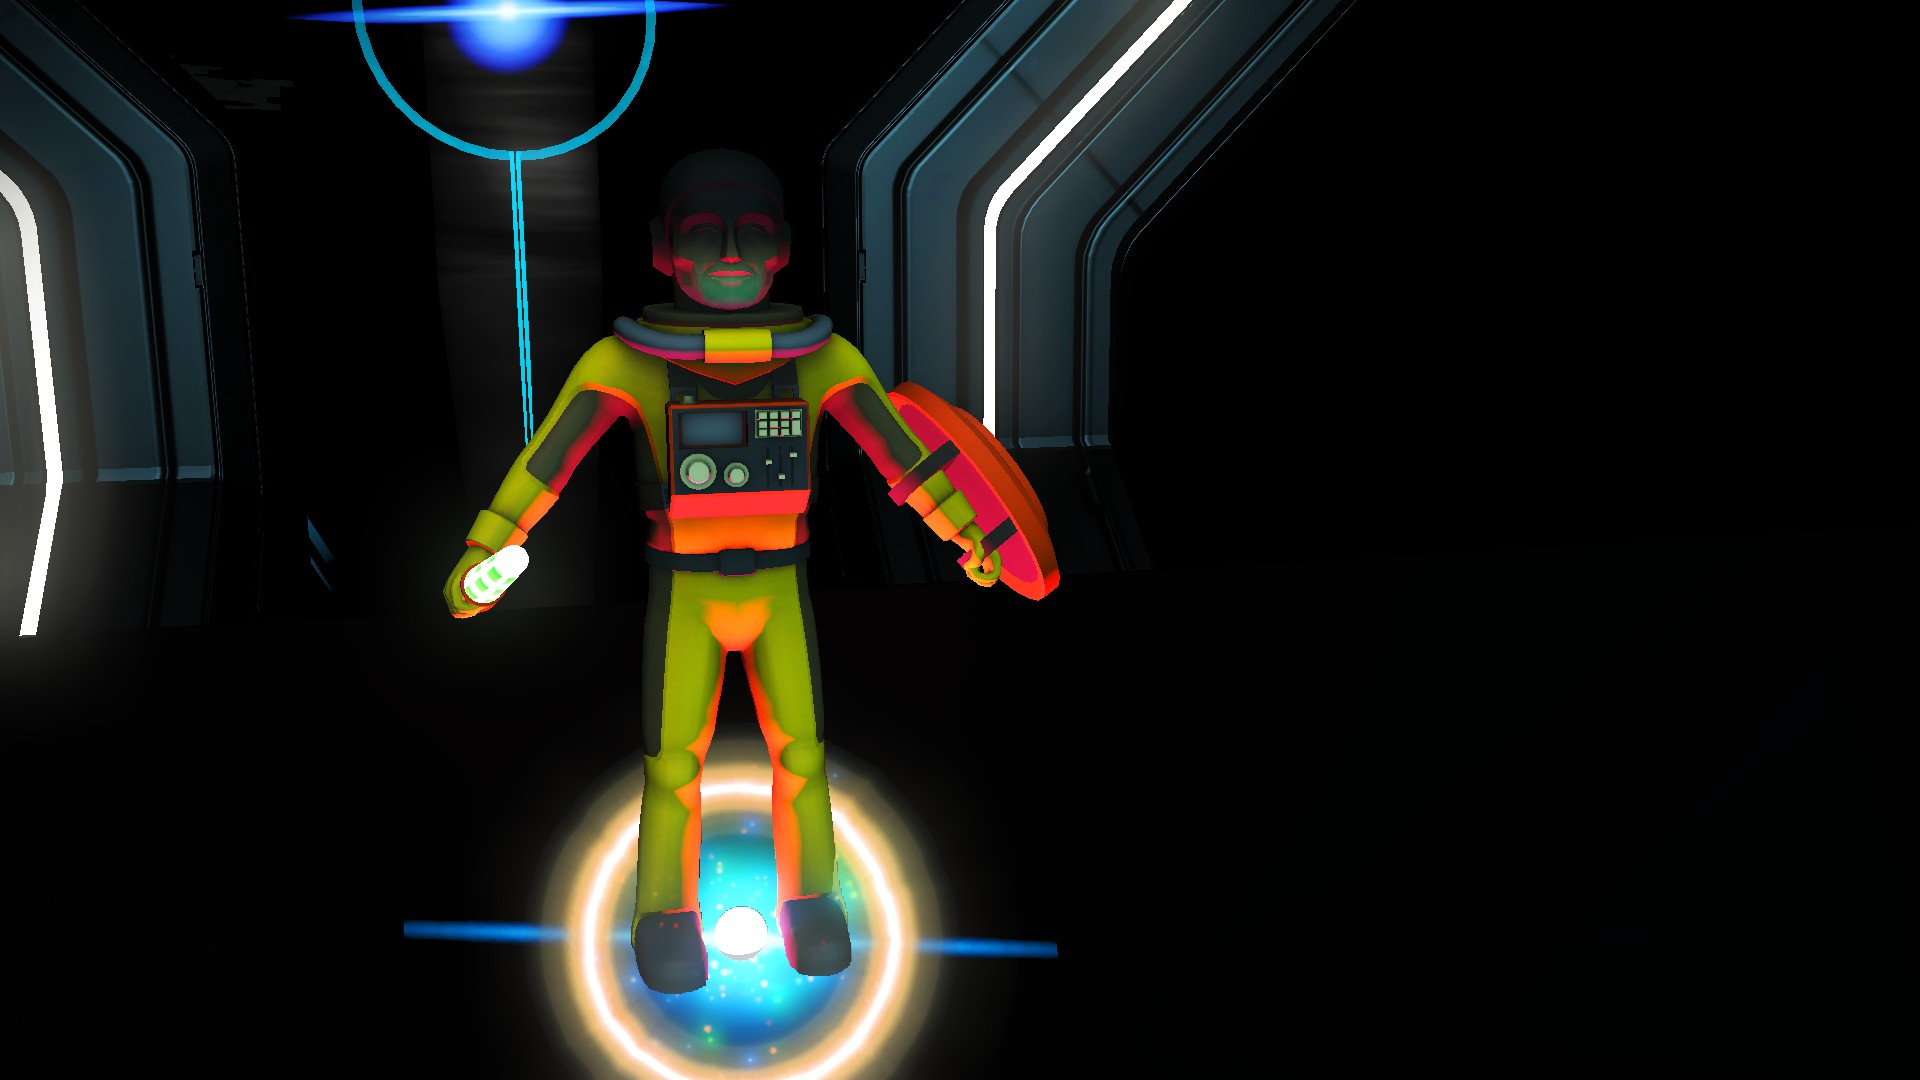 Multiplayer Astronaut Player Model